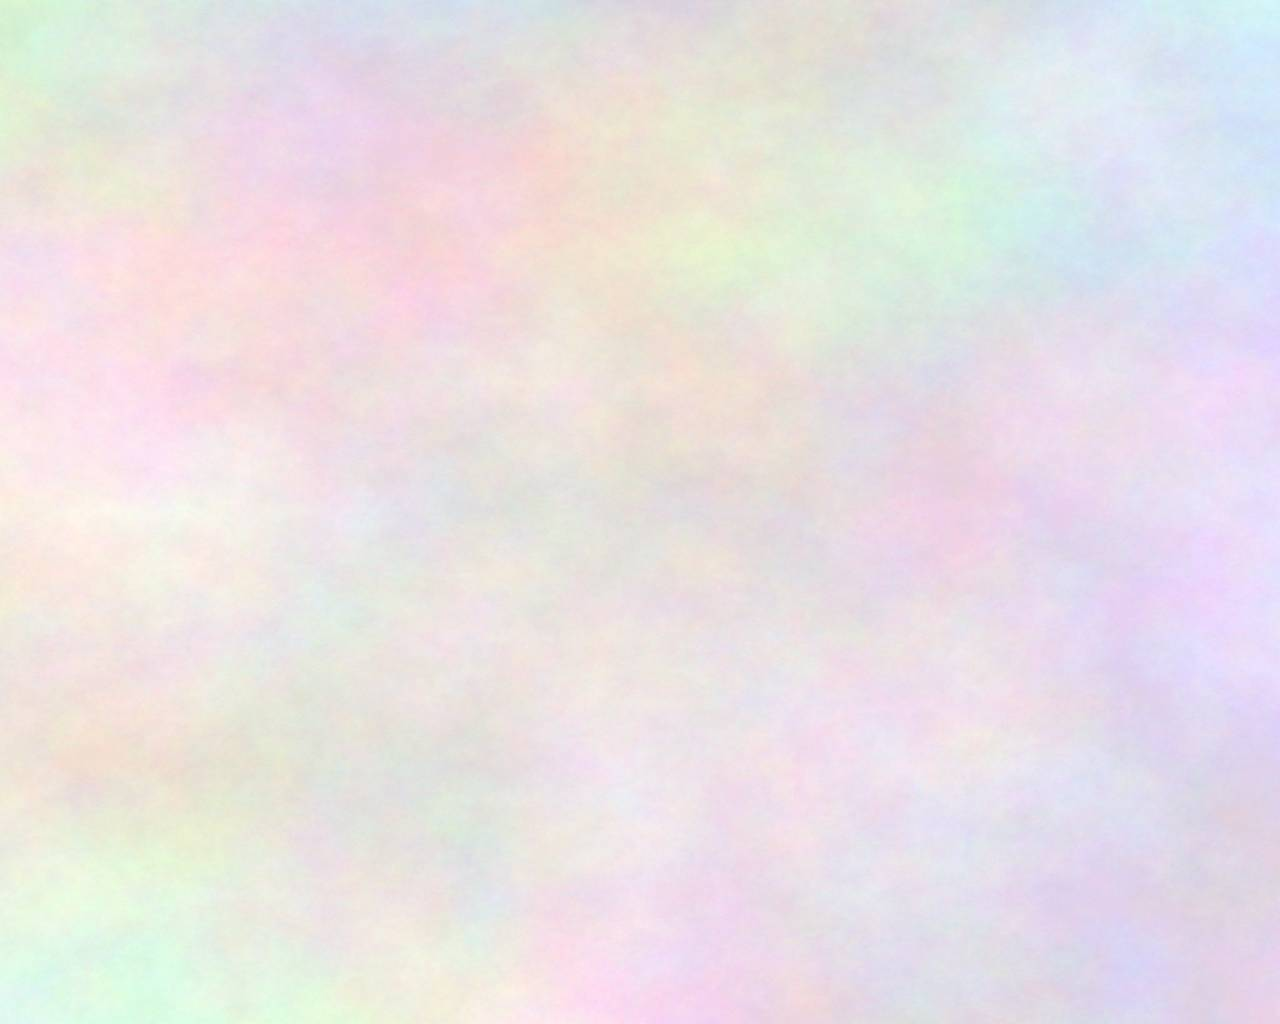 tumblr pastel backgrounds - photo #18